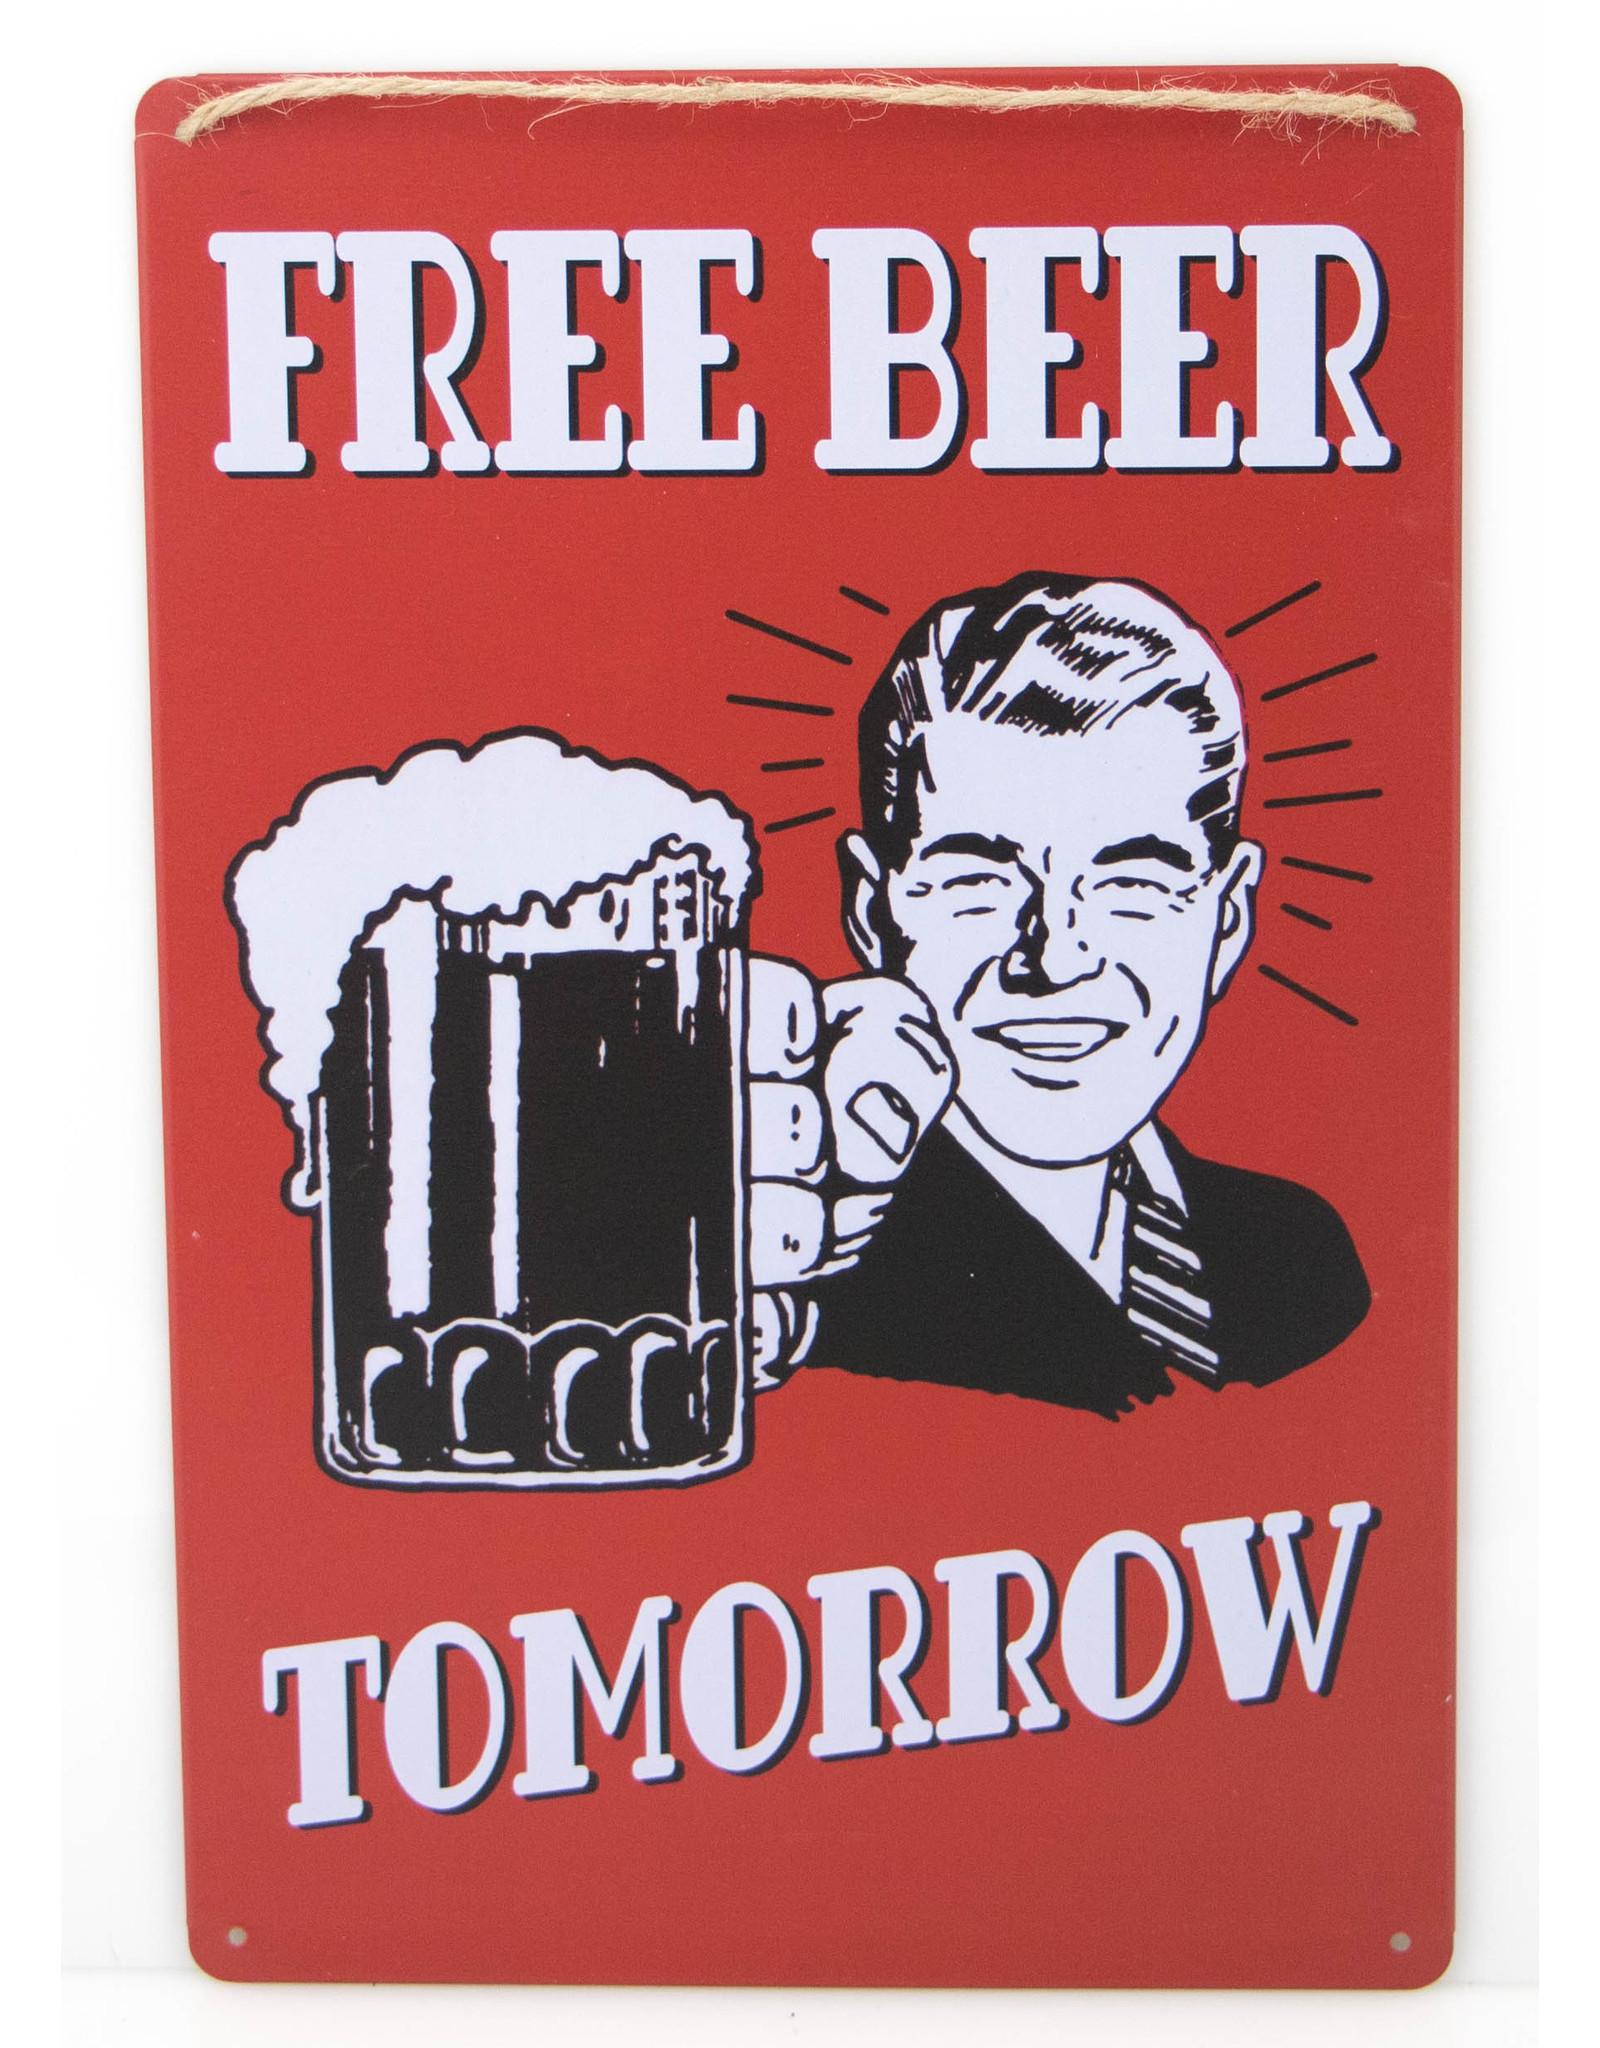 Free beer ... Tomorrow